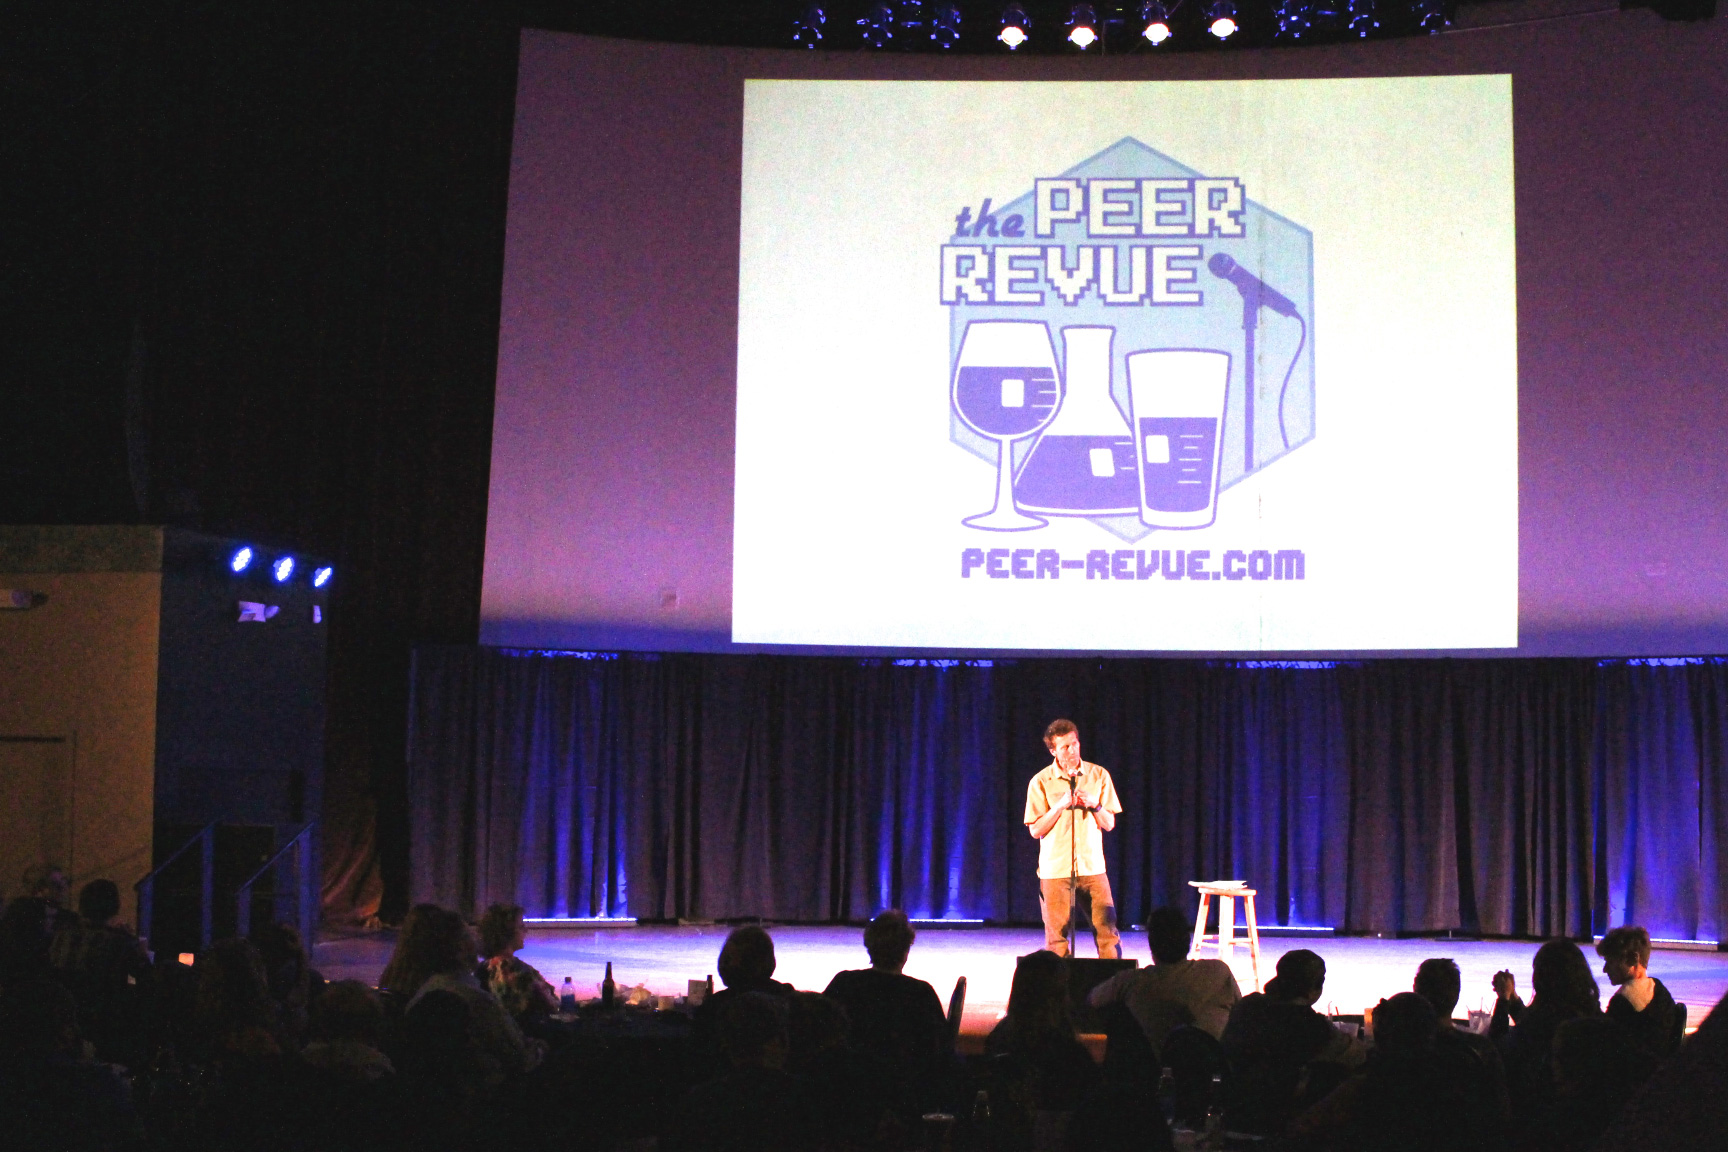 What is the Peer Revue?